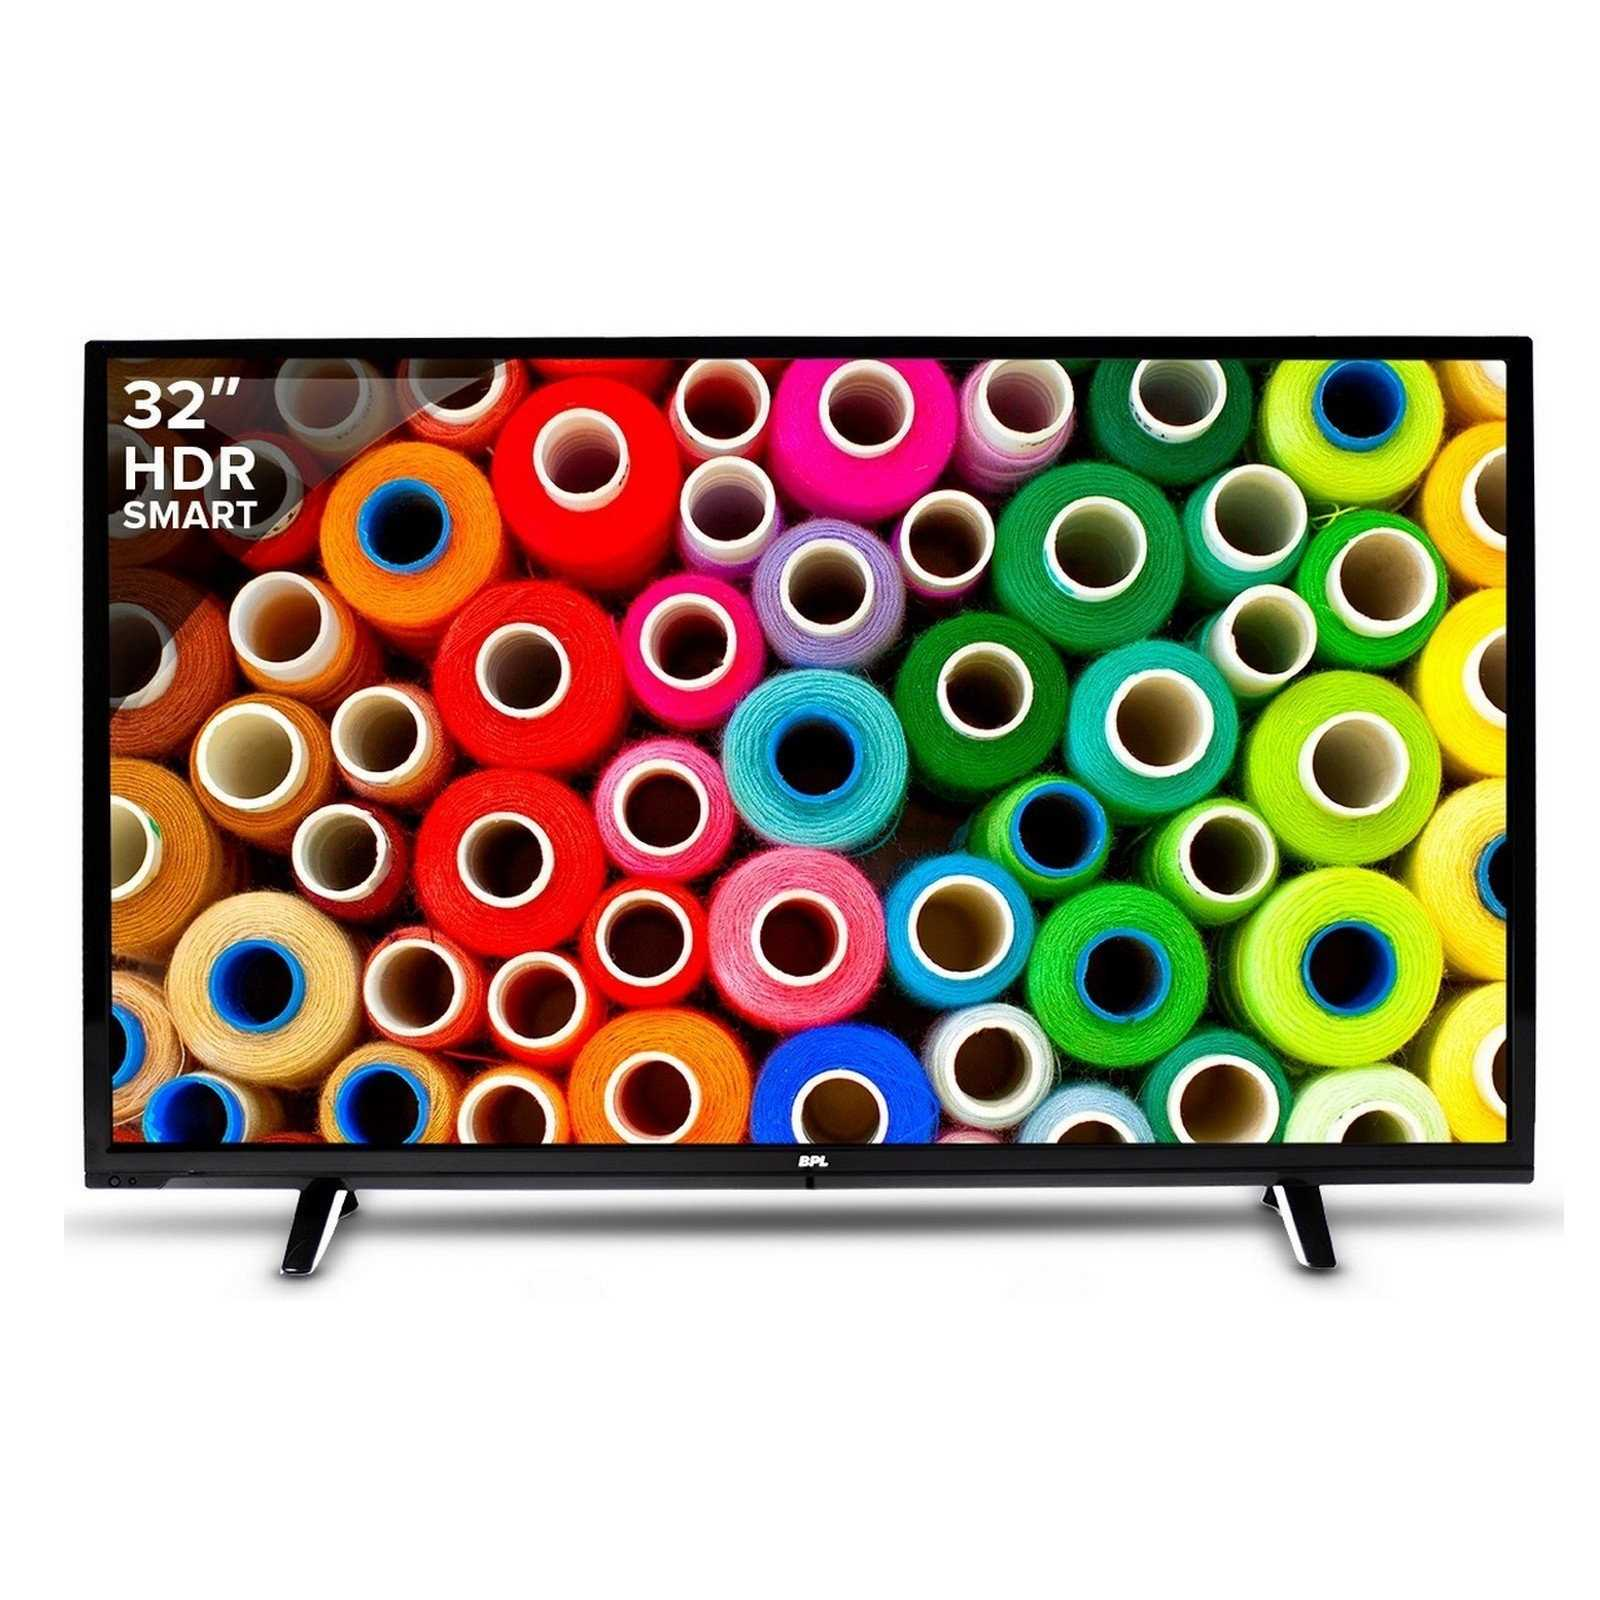 BPL Stellar BPL080A36SHJ 32 Inch HD Ready Smart LED Television